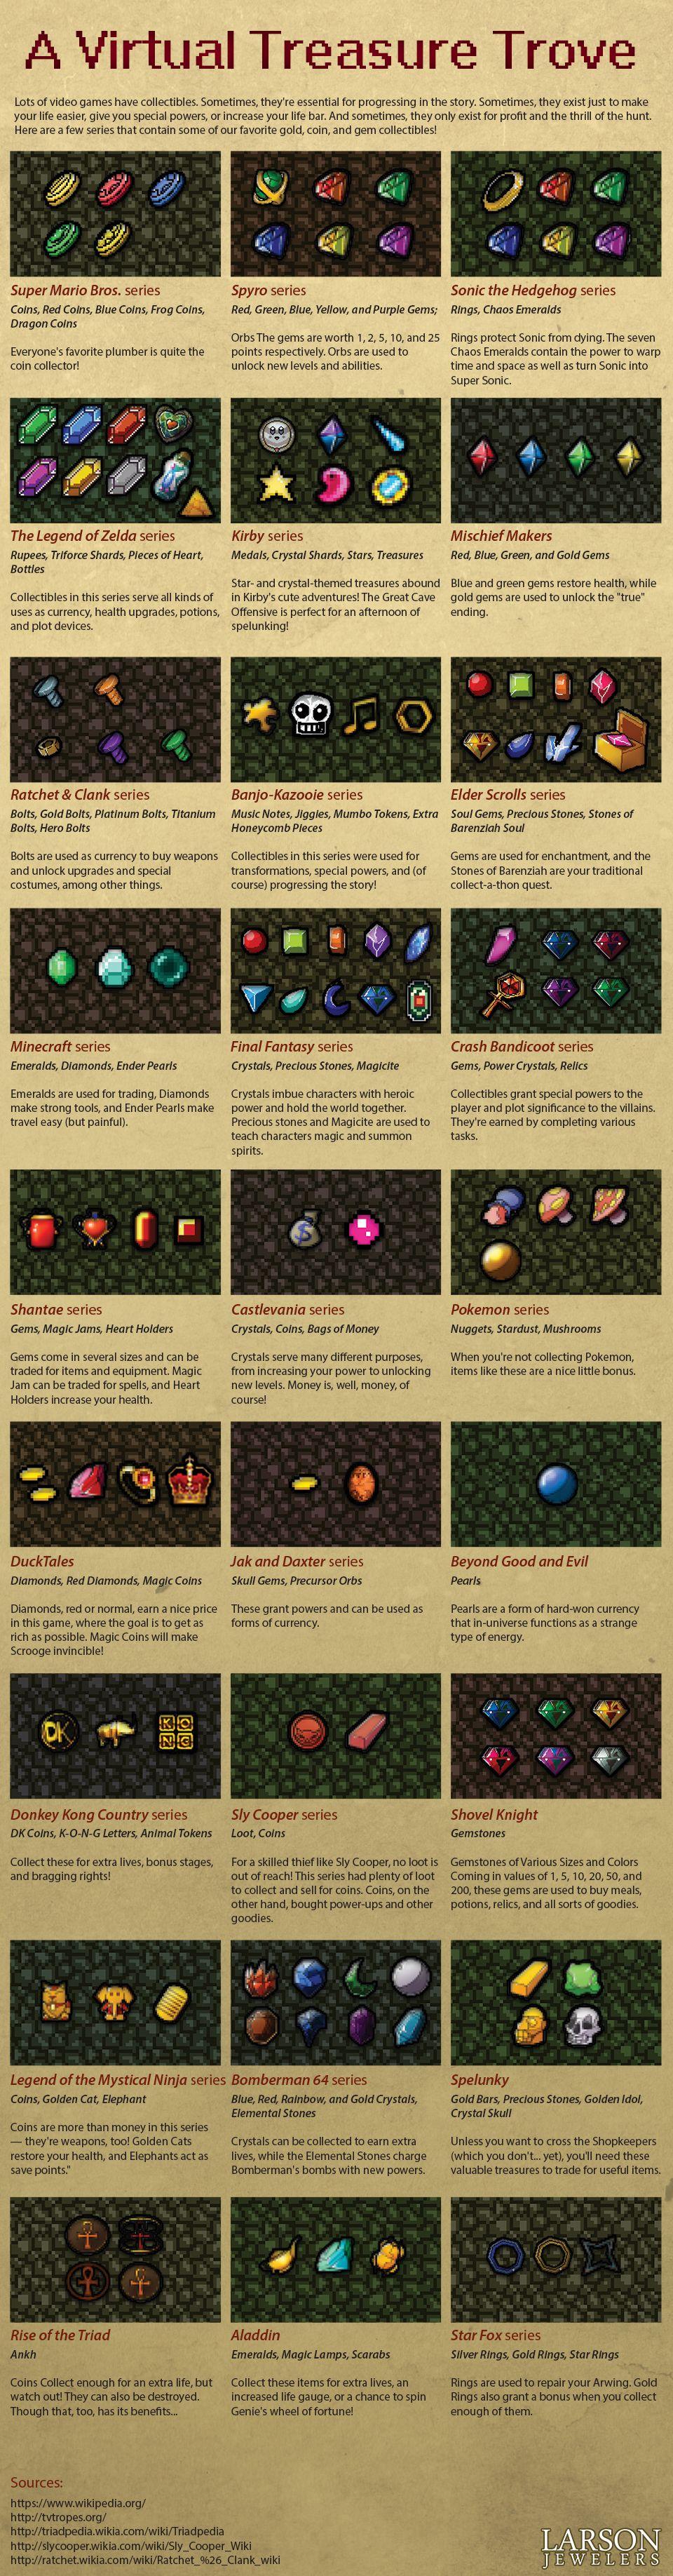 Stones Of Barenziah Map : stones, barenziah, Virtual, Treasure, Trove, #Infographic, Infographic, Marketing,, Educational, Infographic,, Money, Online